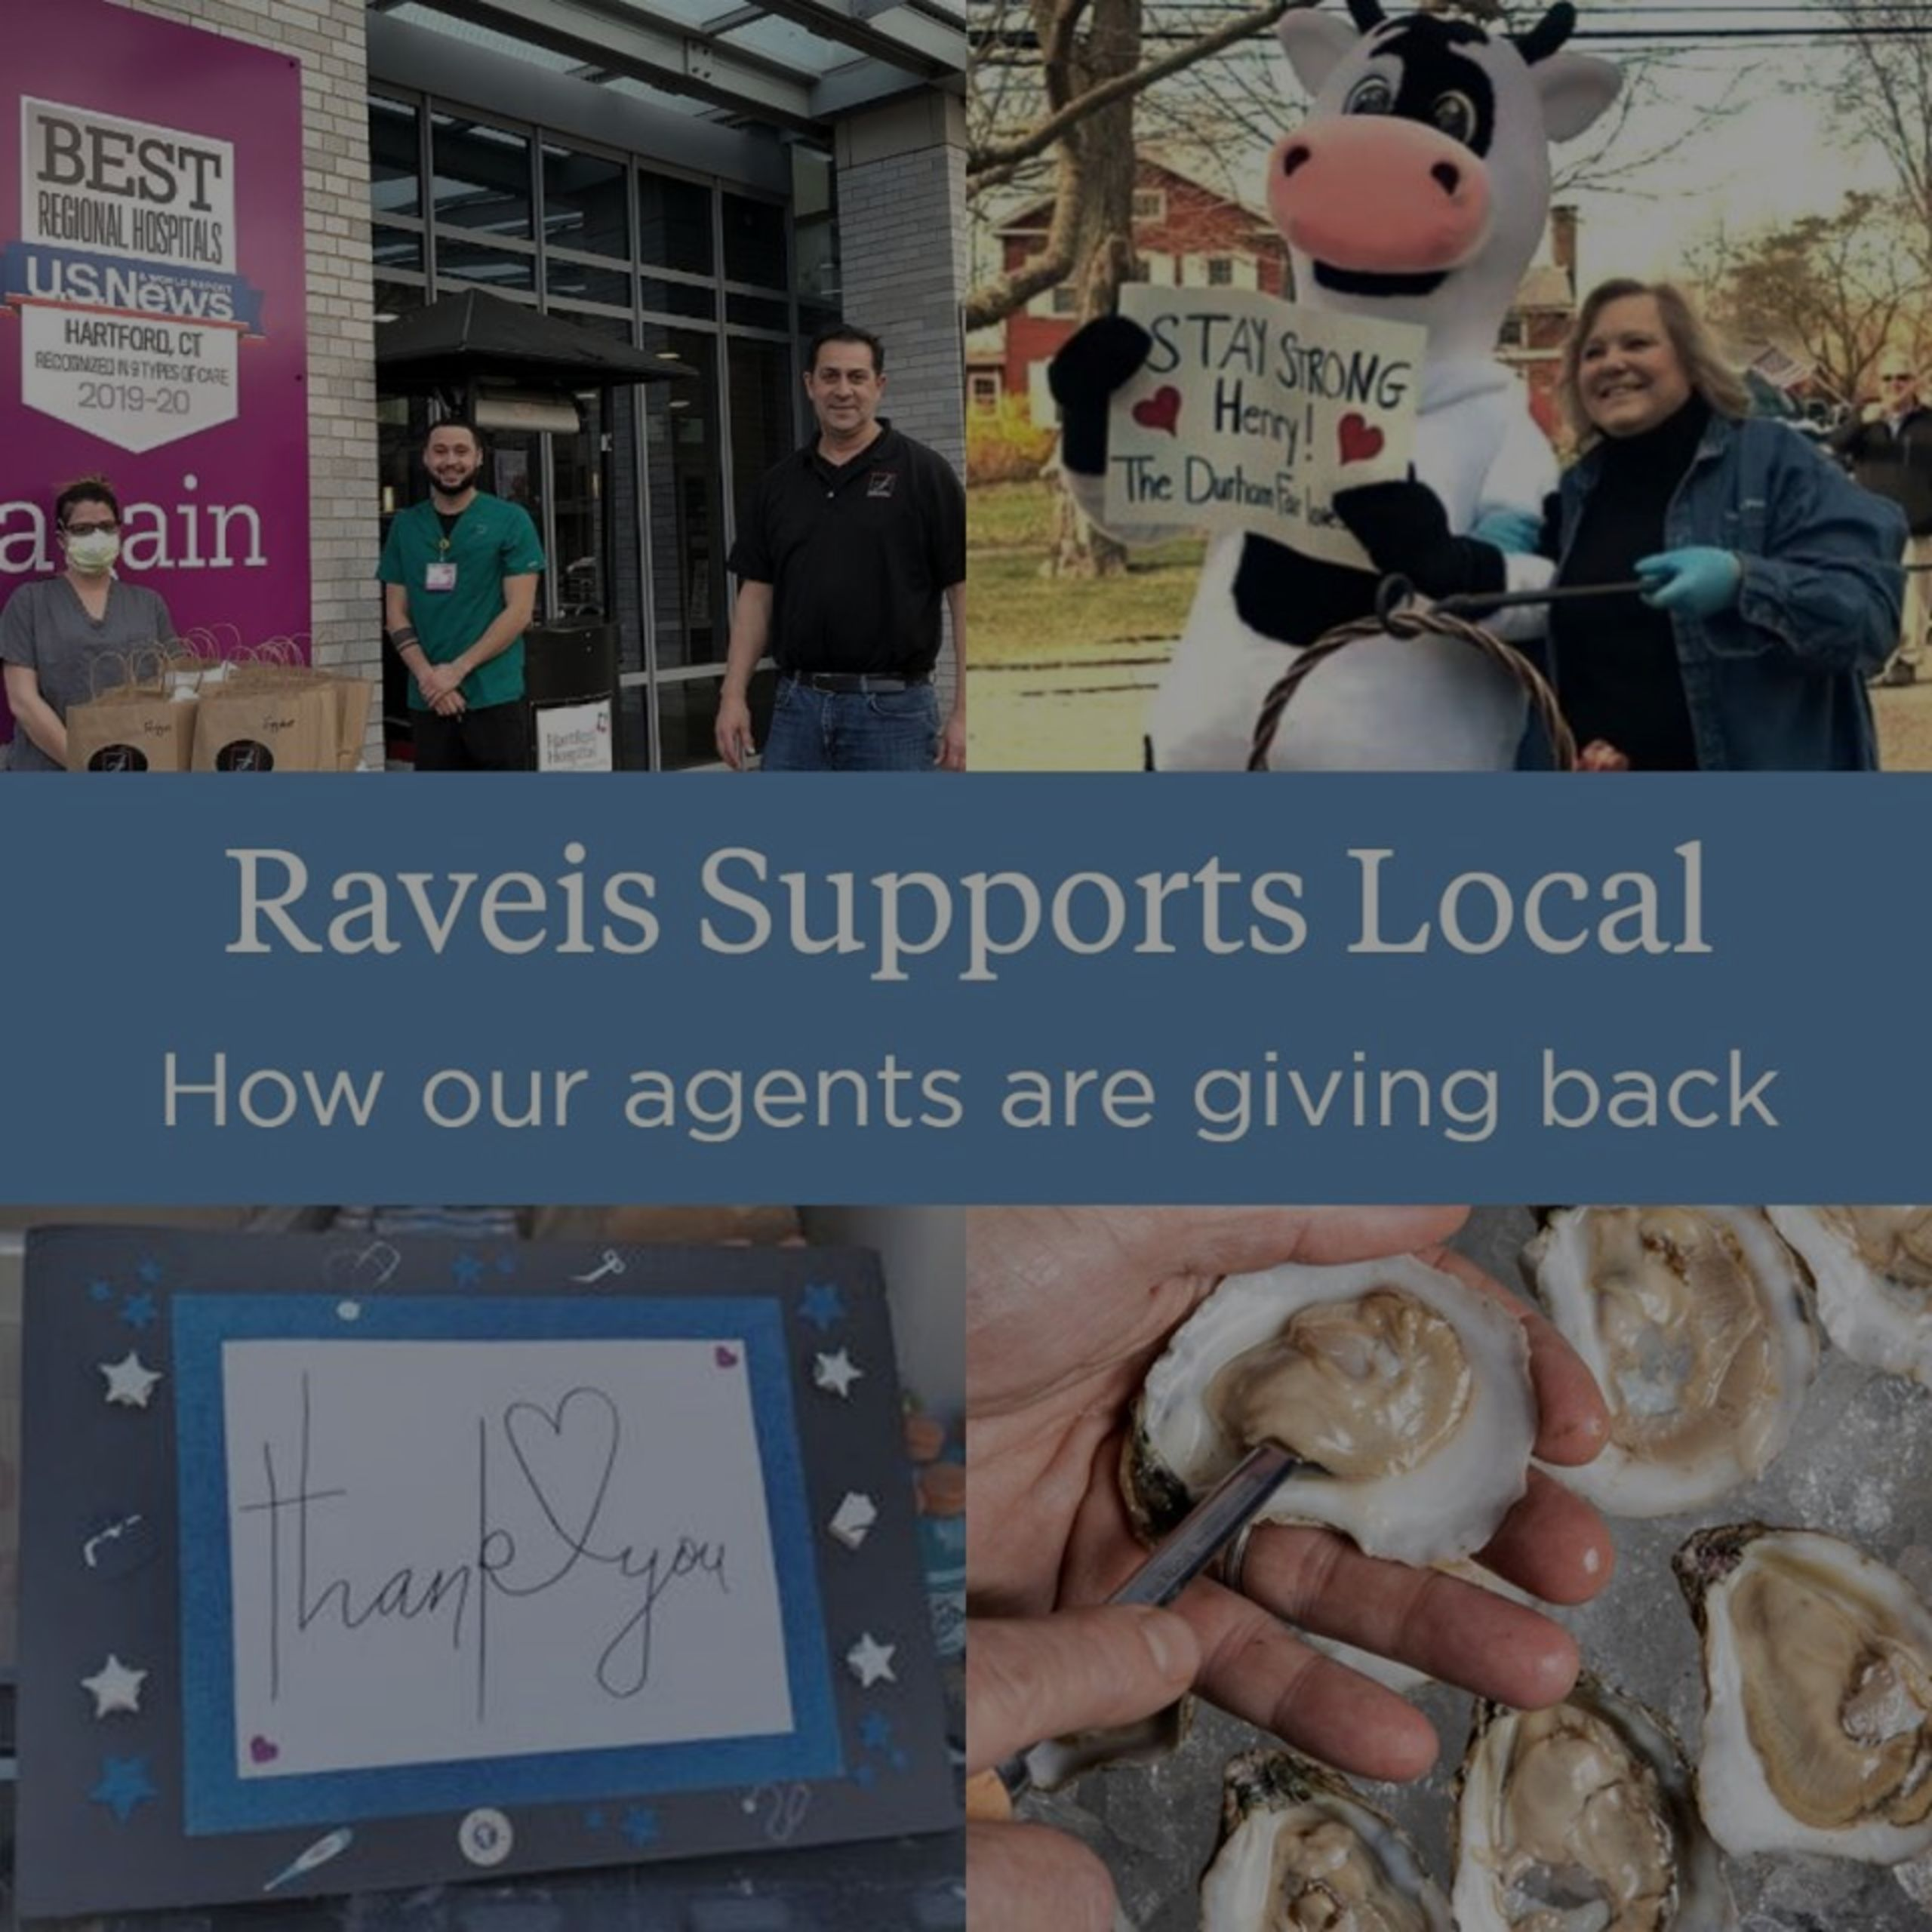 Raveis Supports Locals!